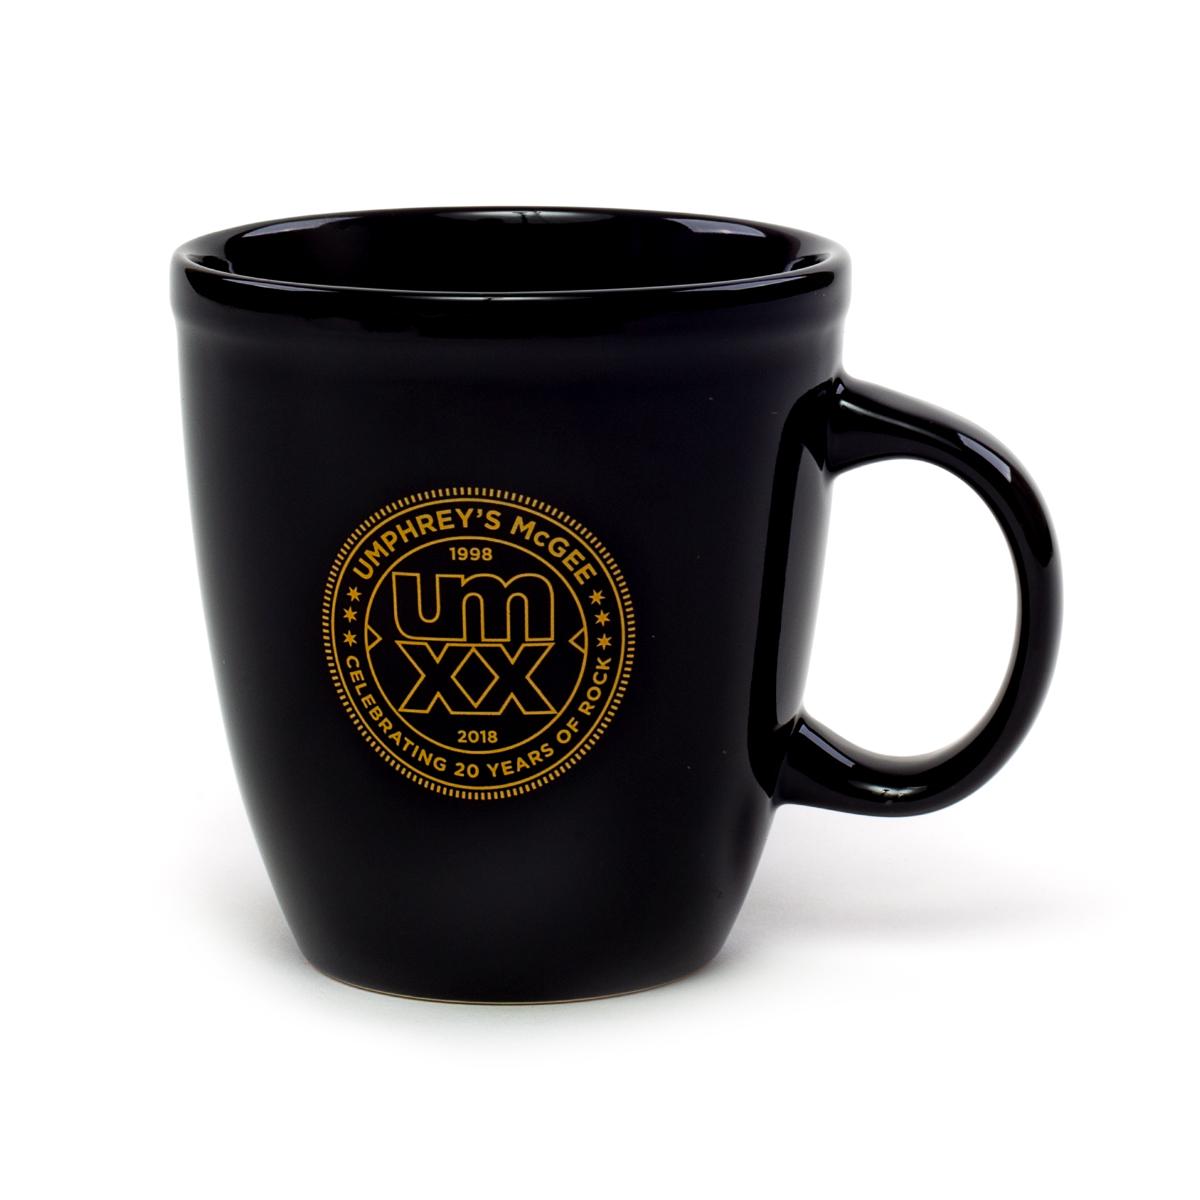 20th Anniversary Mug